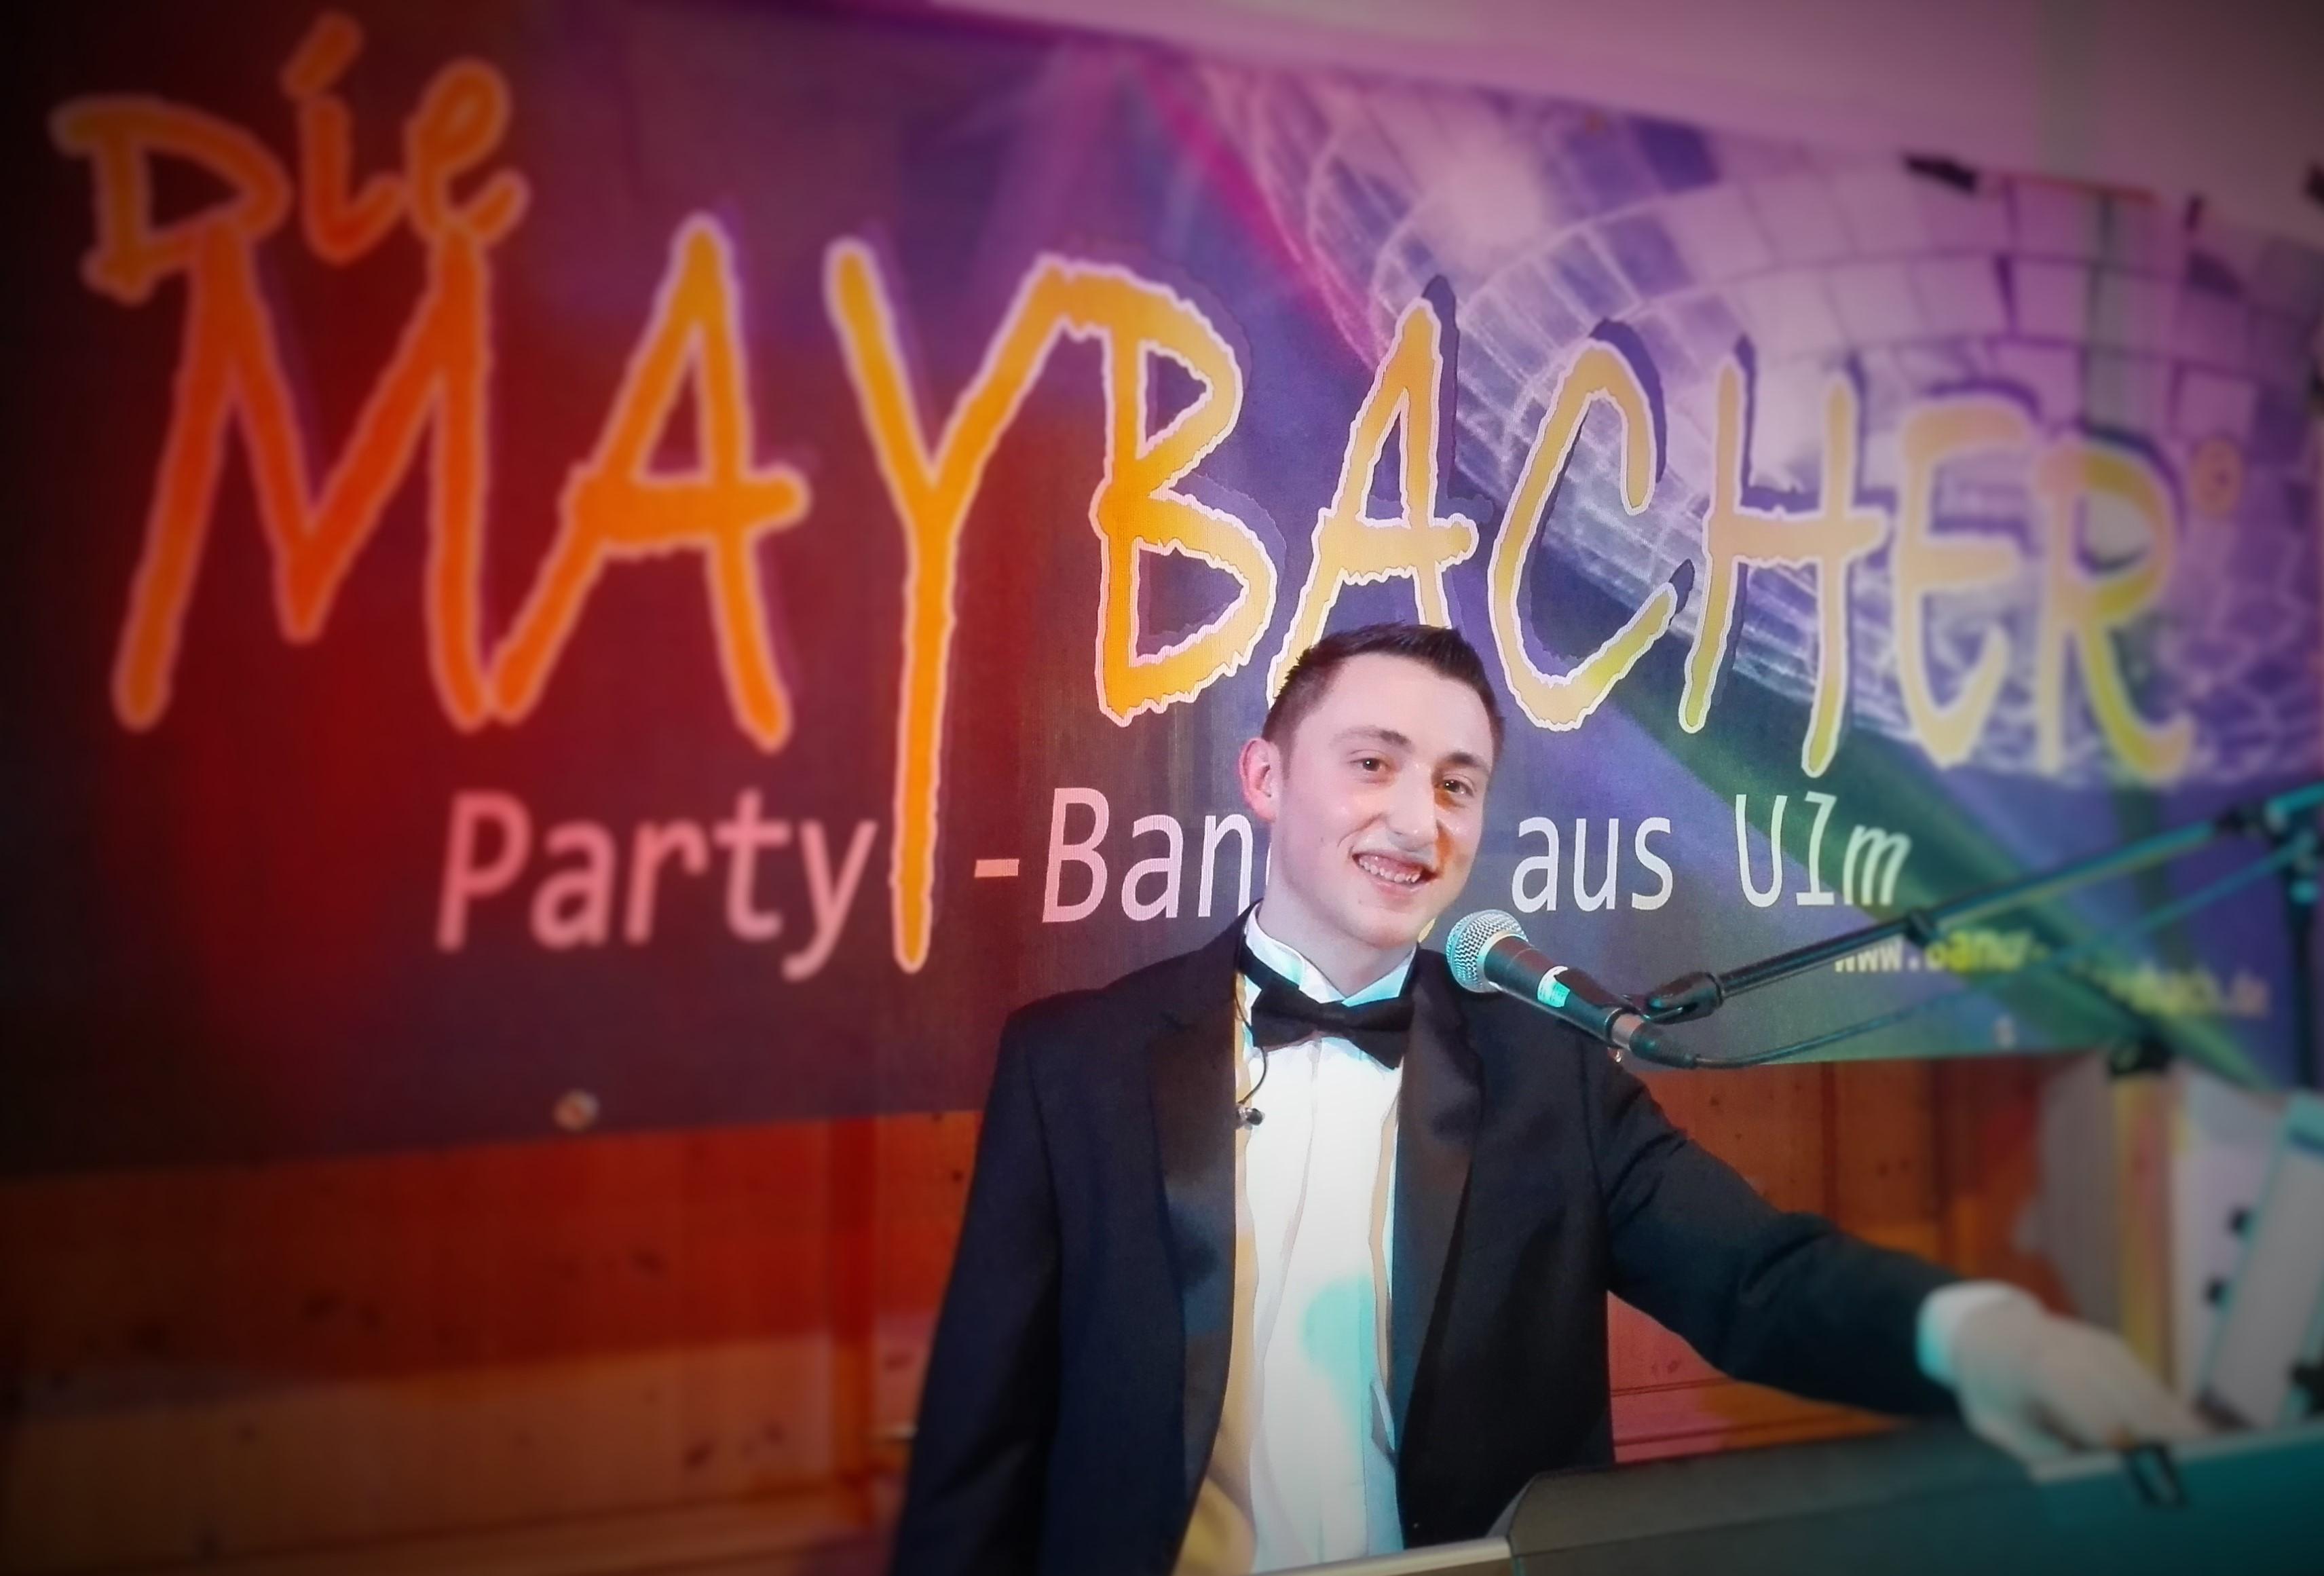 die-maybacher-michael-engelhard